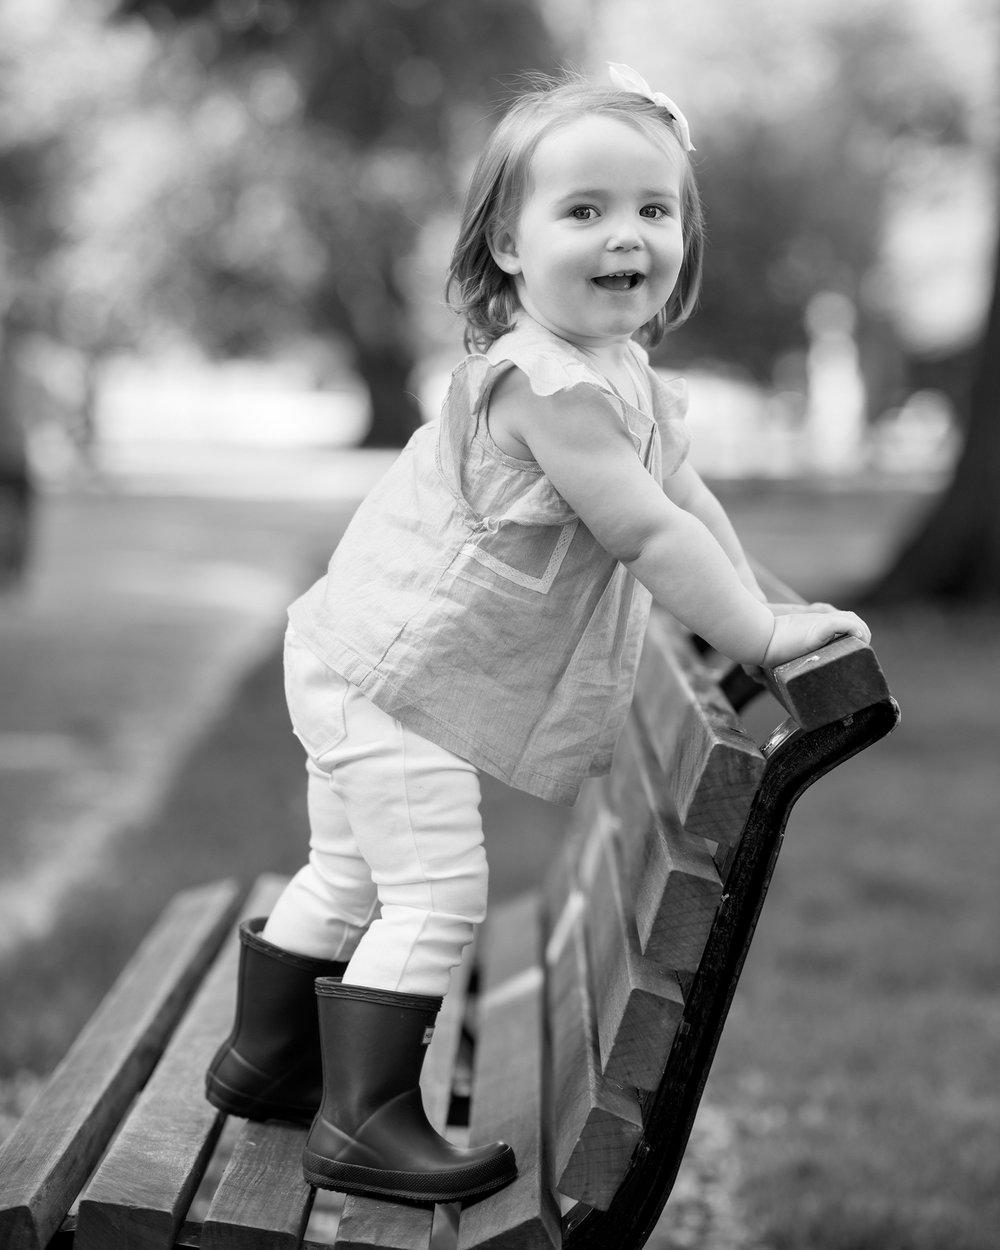 Maureen_Ford_Photography_Kids_0003.JPG